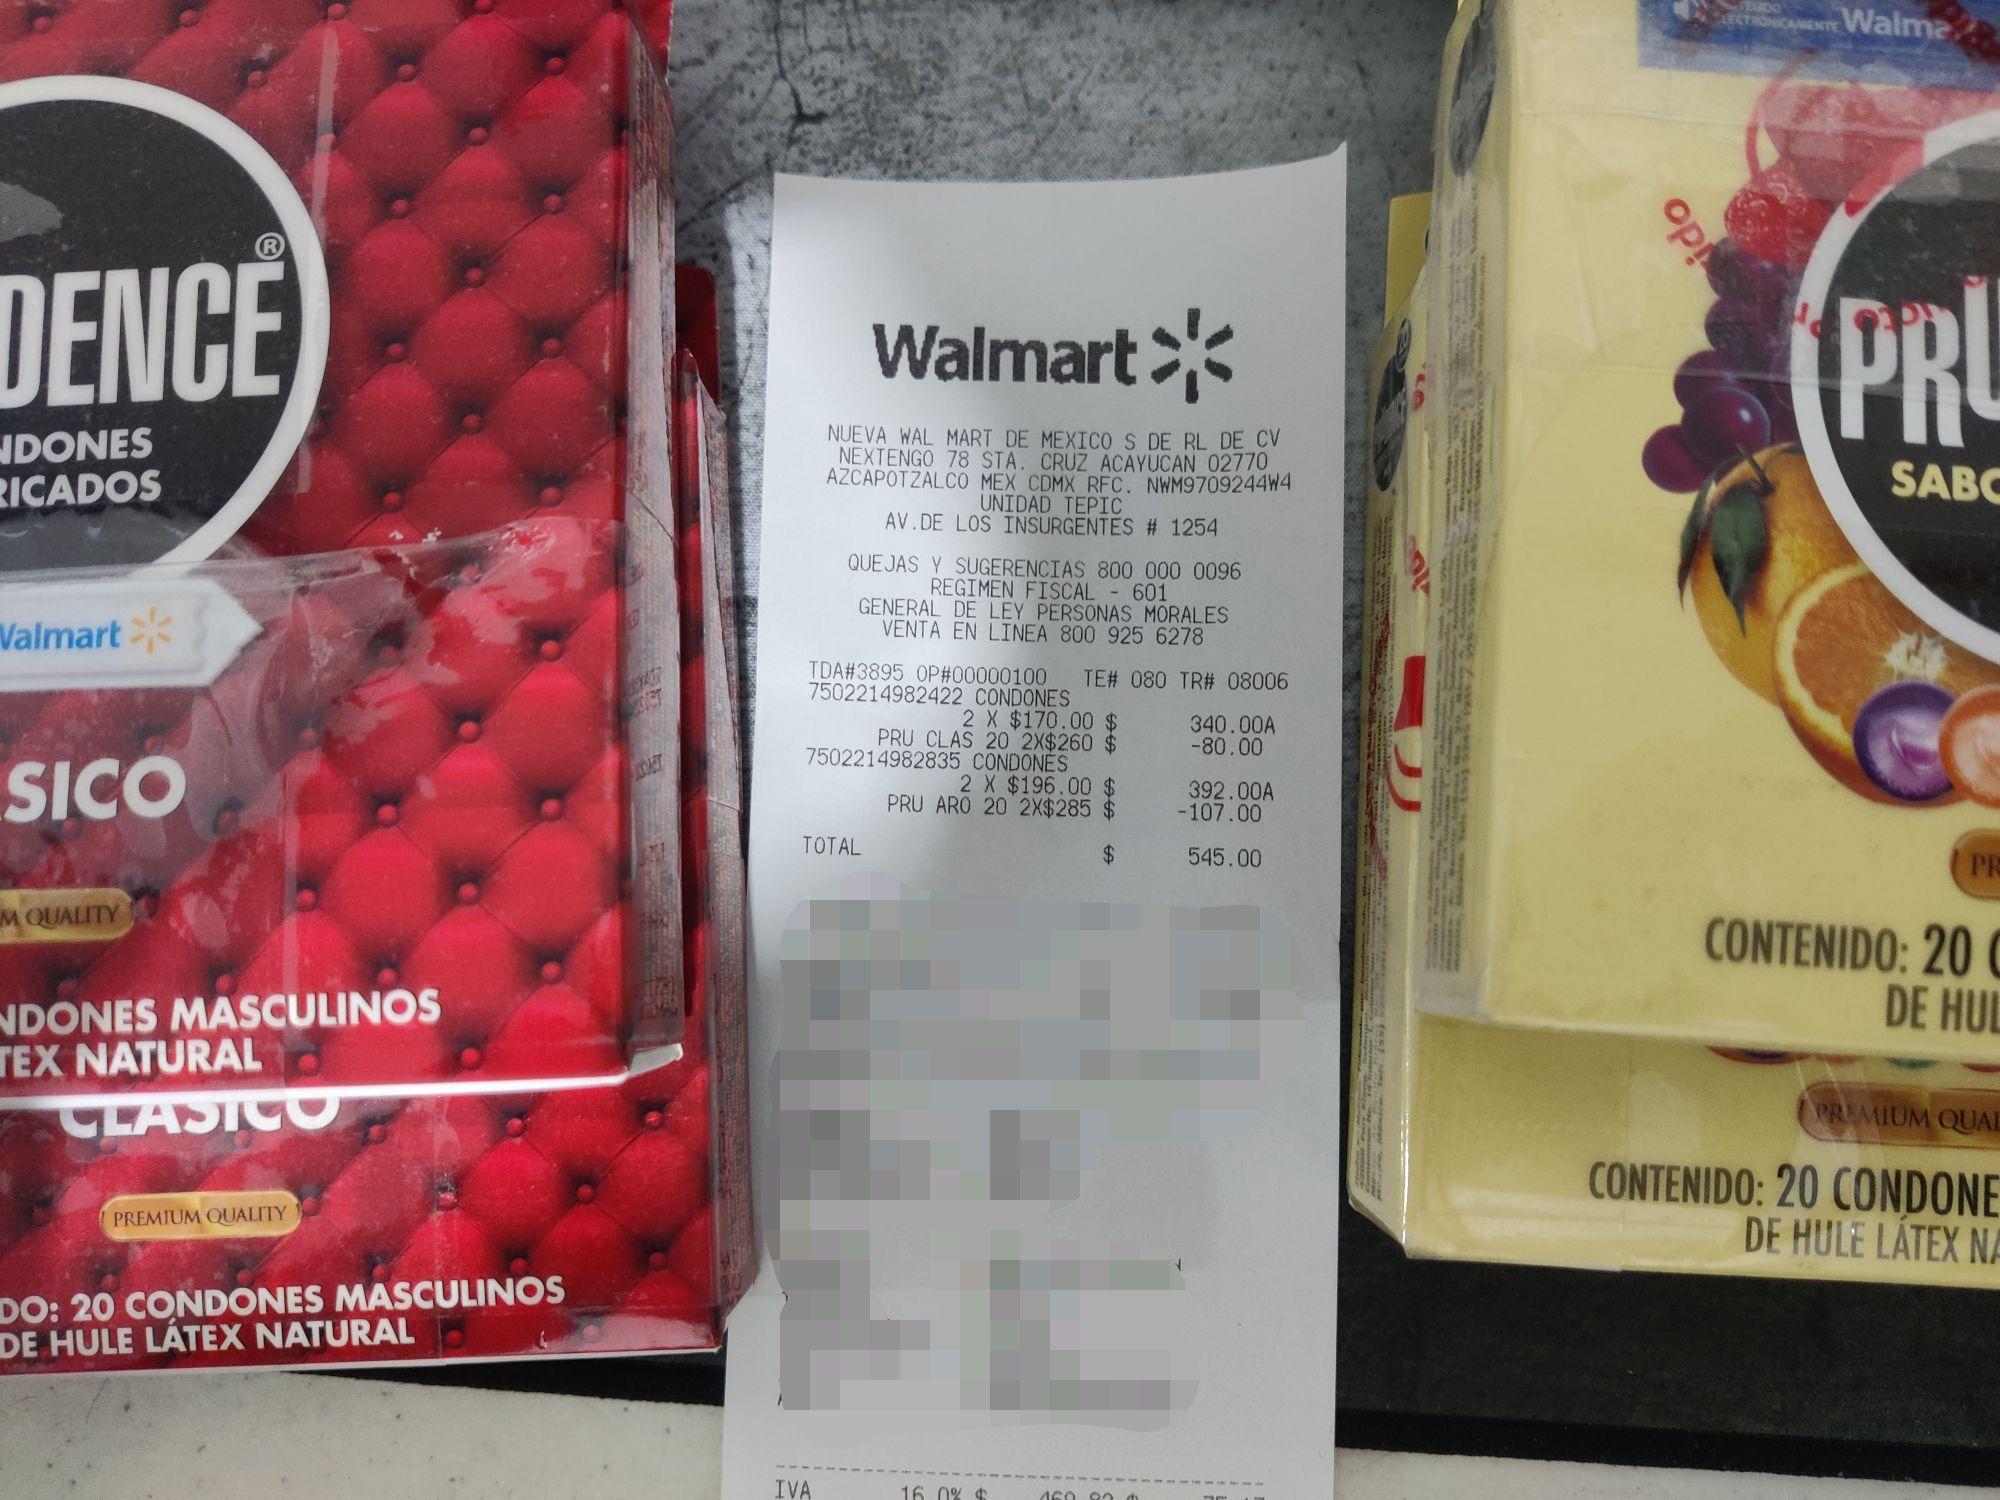 Walmart Tepic: Preservativos prudence 20 piezas. 2x1